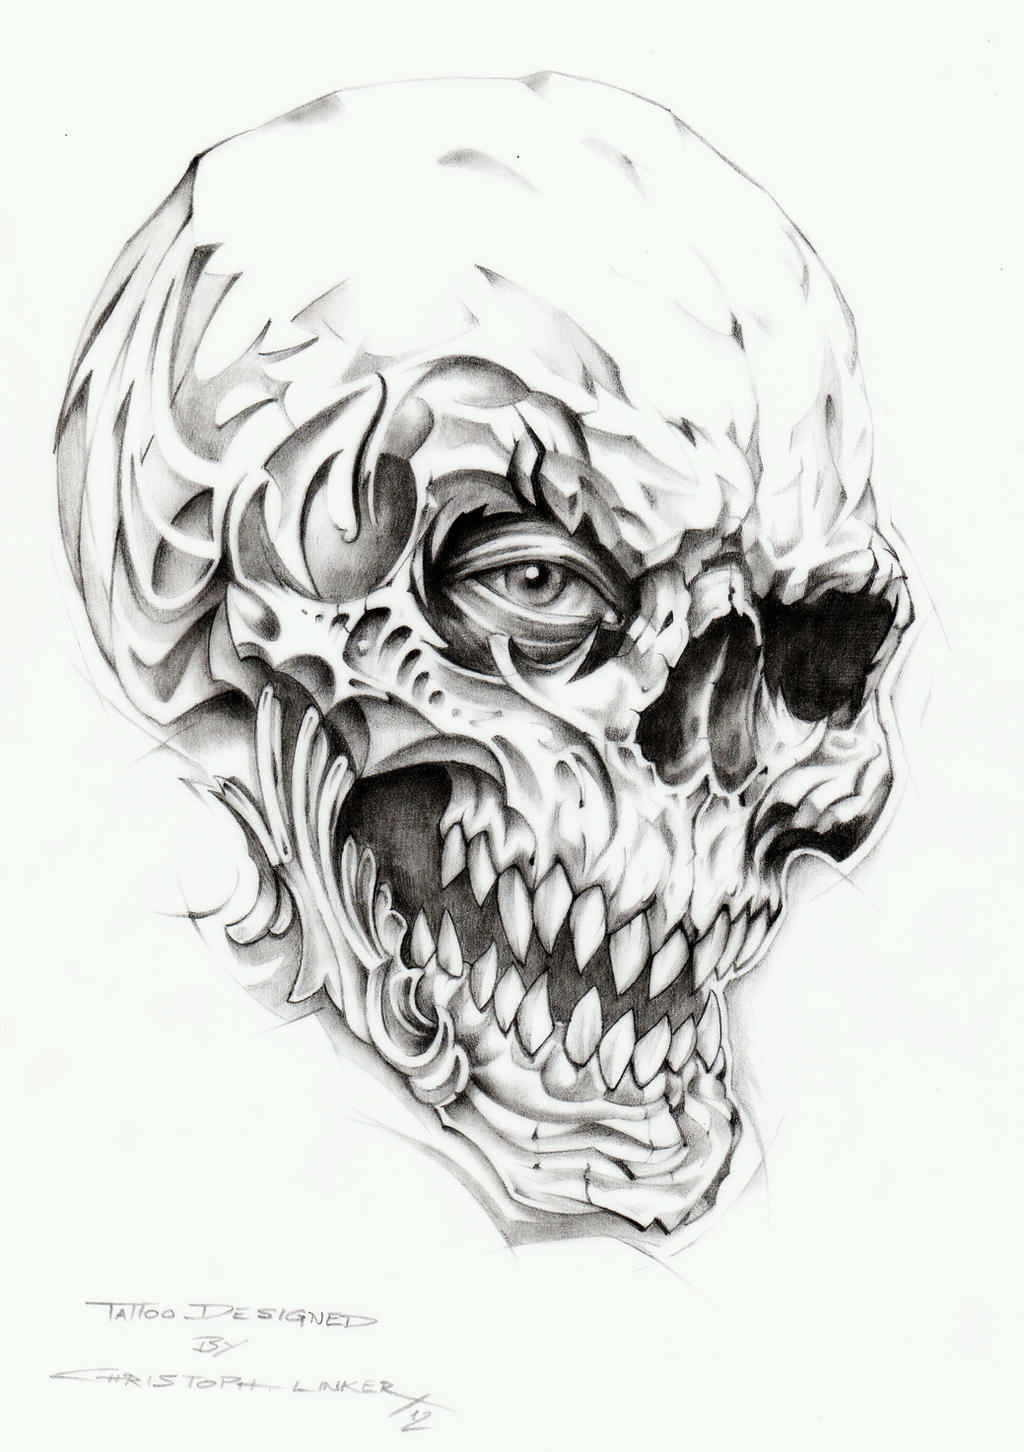 Skull Line Drawing Tattoo : Skull tattoo drawing by linkerart on deviantart